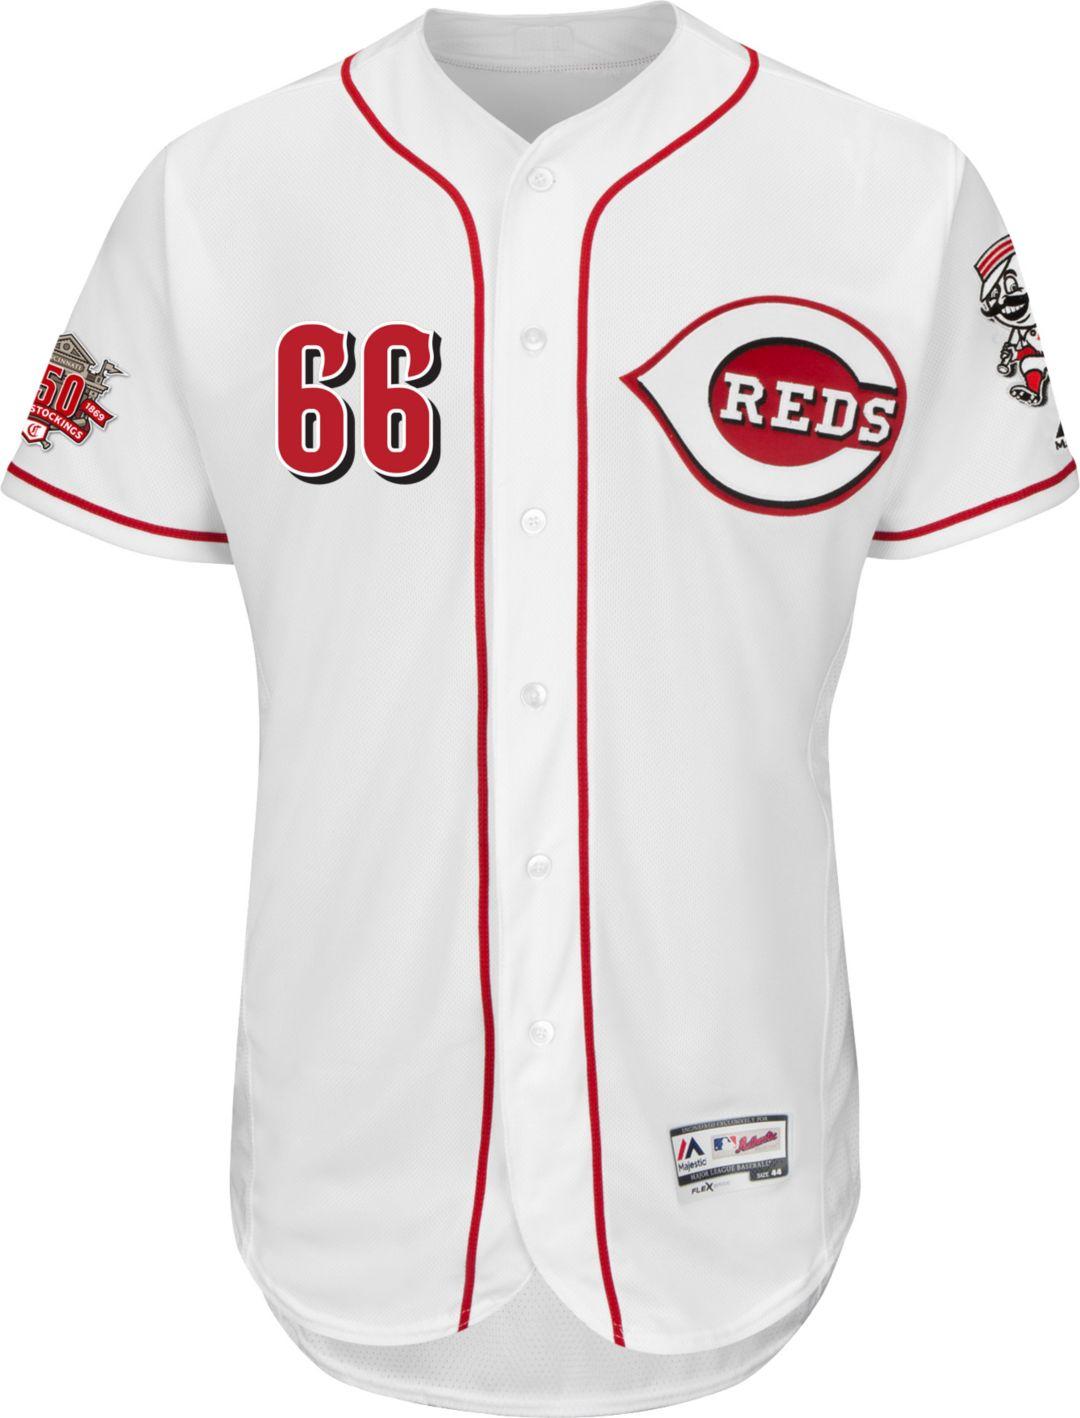 16a31a94b Majestic Men s Authentic Cincinnati Reds Yasiel Puig  66 Flex Base Home  White On-Field